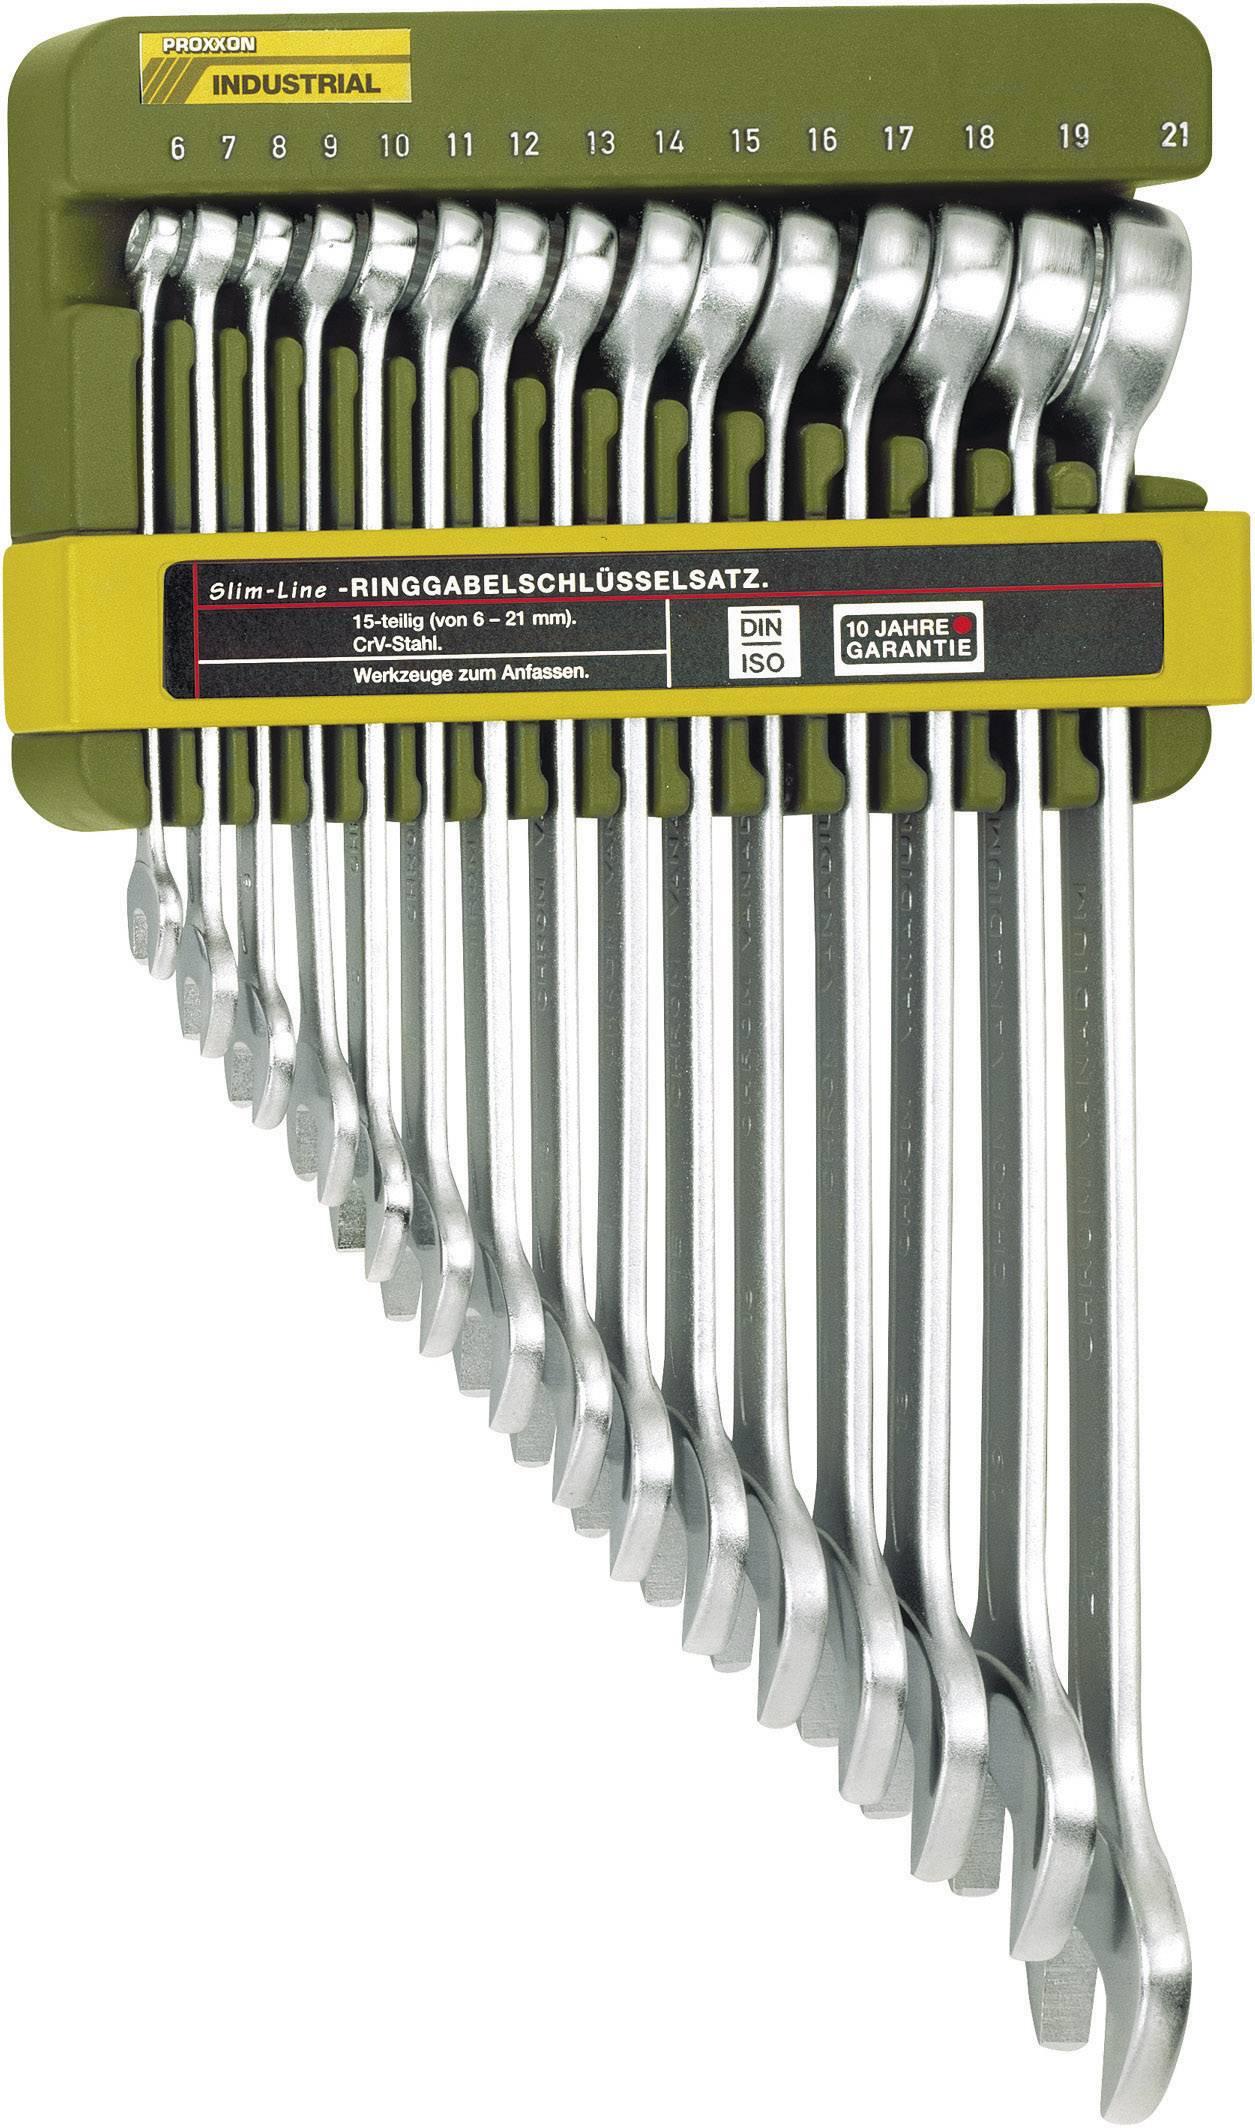 Sada očkoplochých kľúčov Proxxon Industrial 23821, 6 - 21 mm, 15-dielna